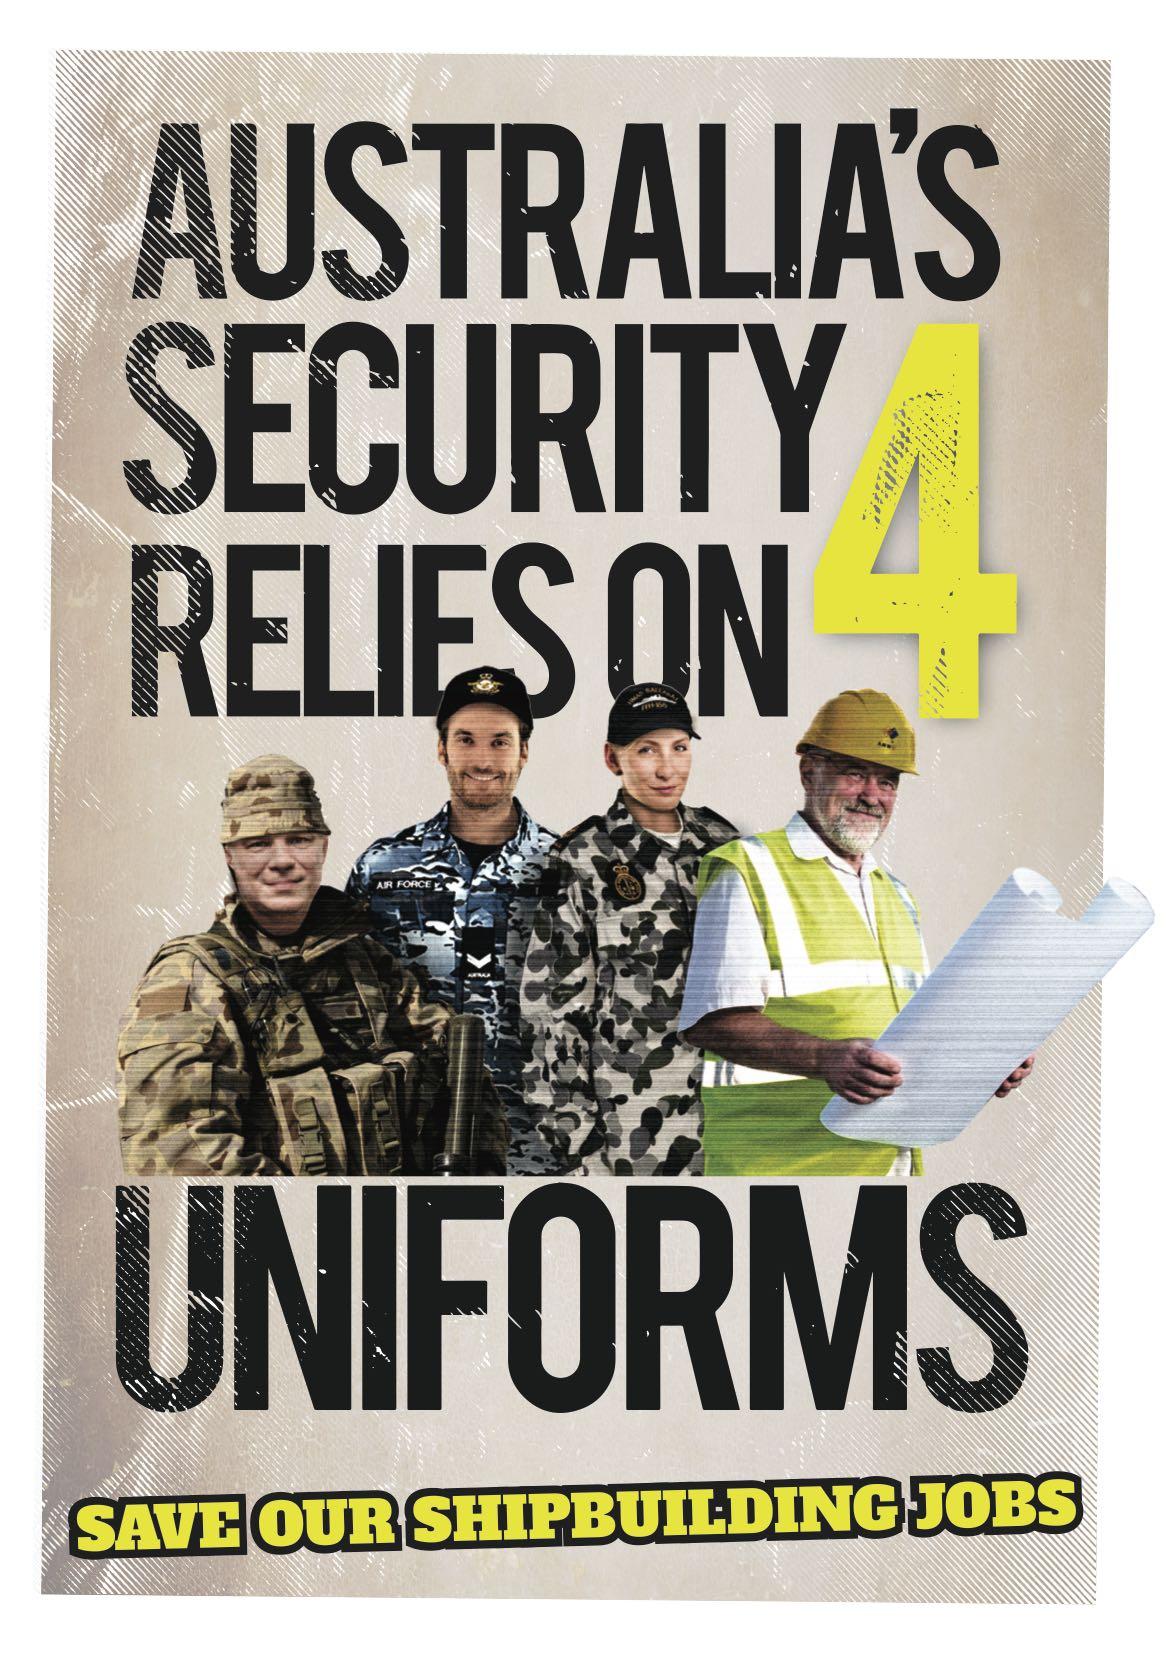 A3_Uniform_Campaign_Poster_.jpg